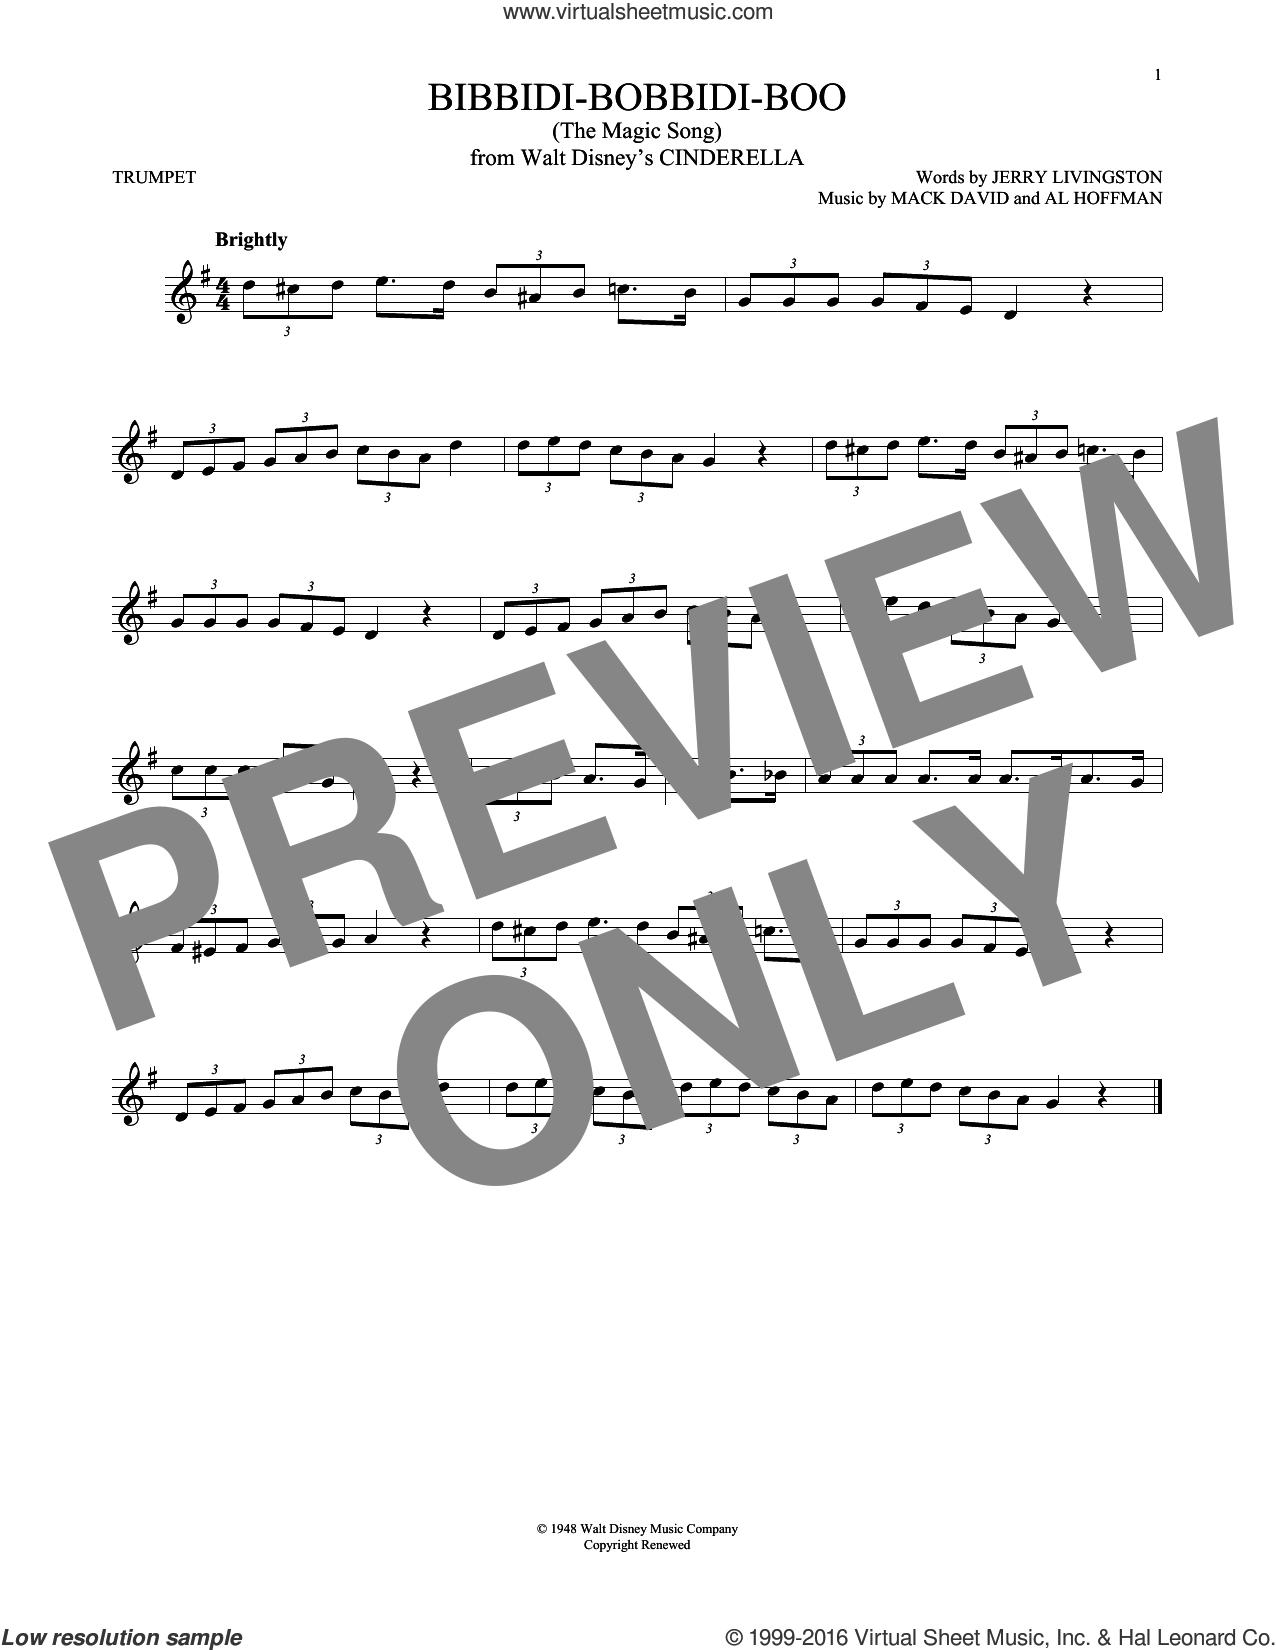 Bibbidi-Bobbidi-Boo (The Magic Song) sheet music for trumpet solo by Jerry Livingston, Al Hoffman and Mack David, intermediate skill level